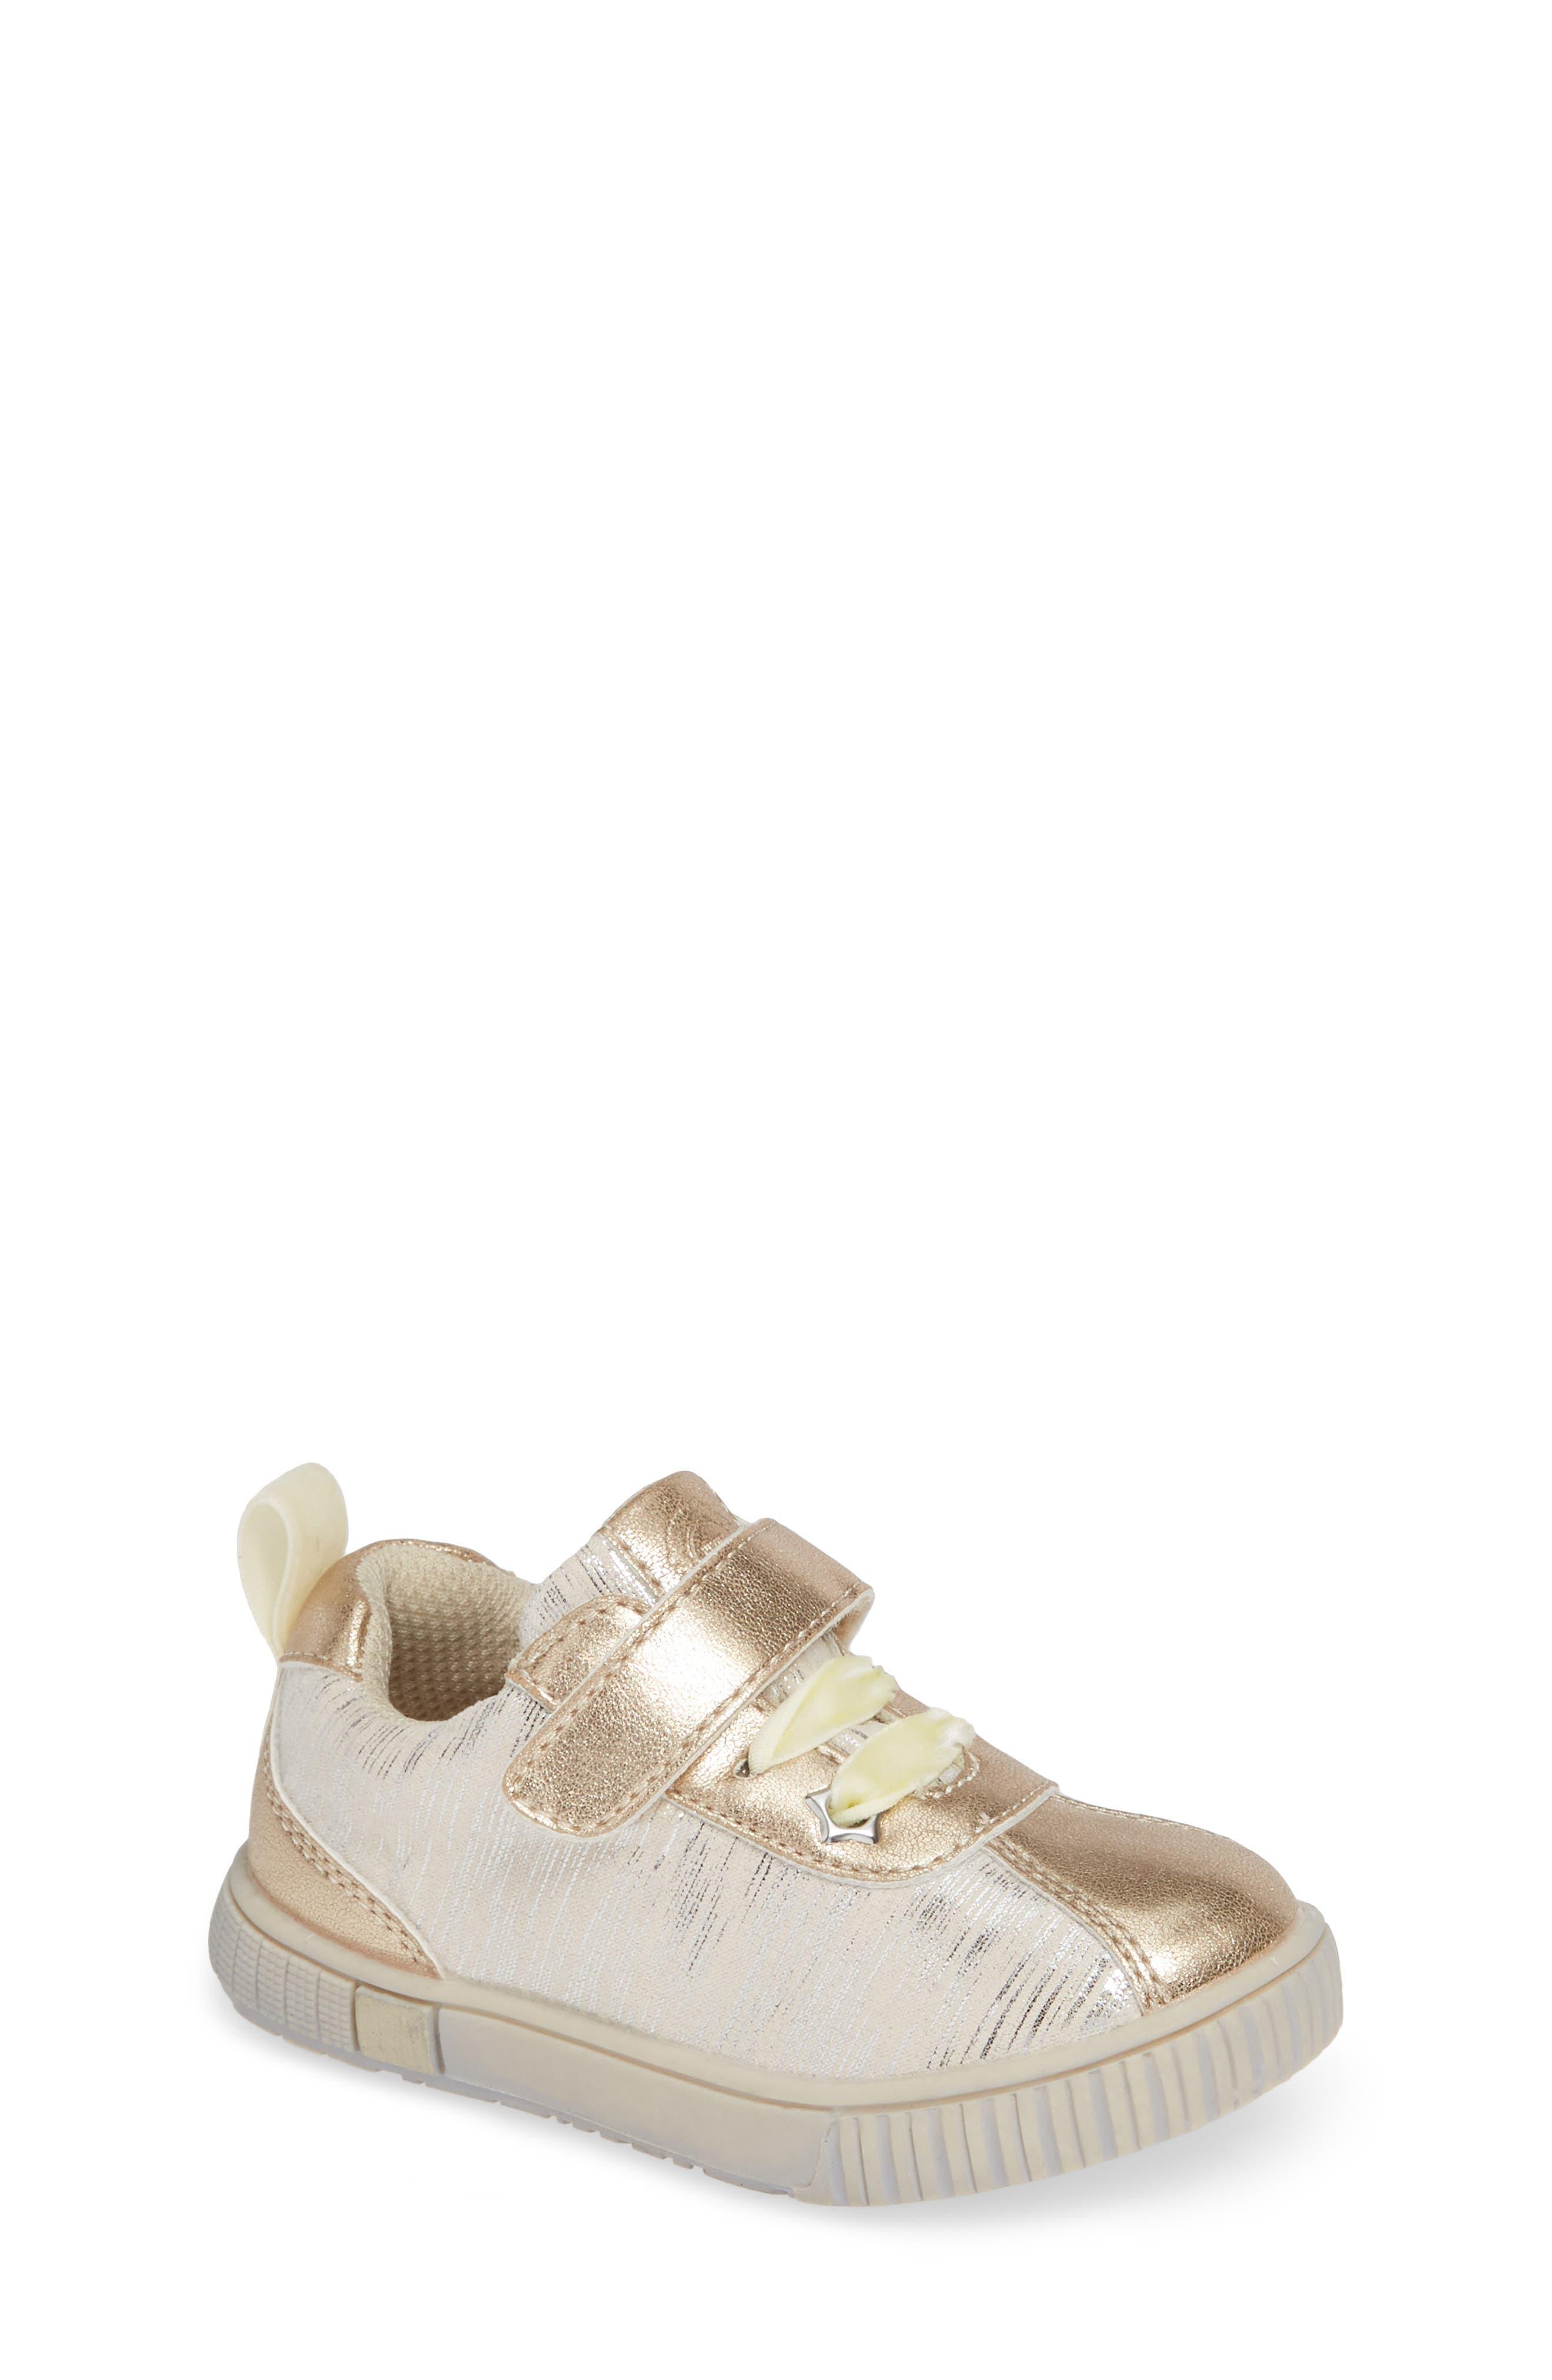 LIVIE & LUCA,                             Spin Metallic Sneaker,                             Main thumbnail 1, color,                             CREAM TINSEL